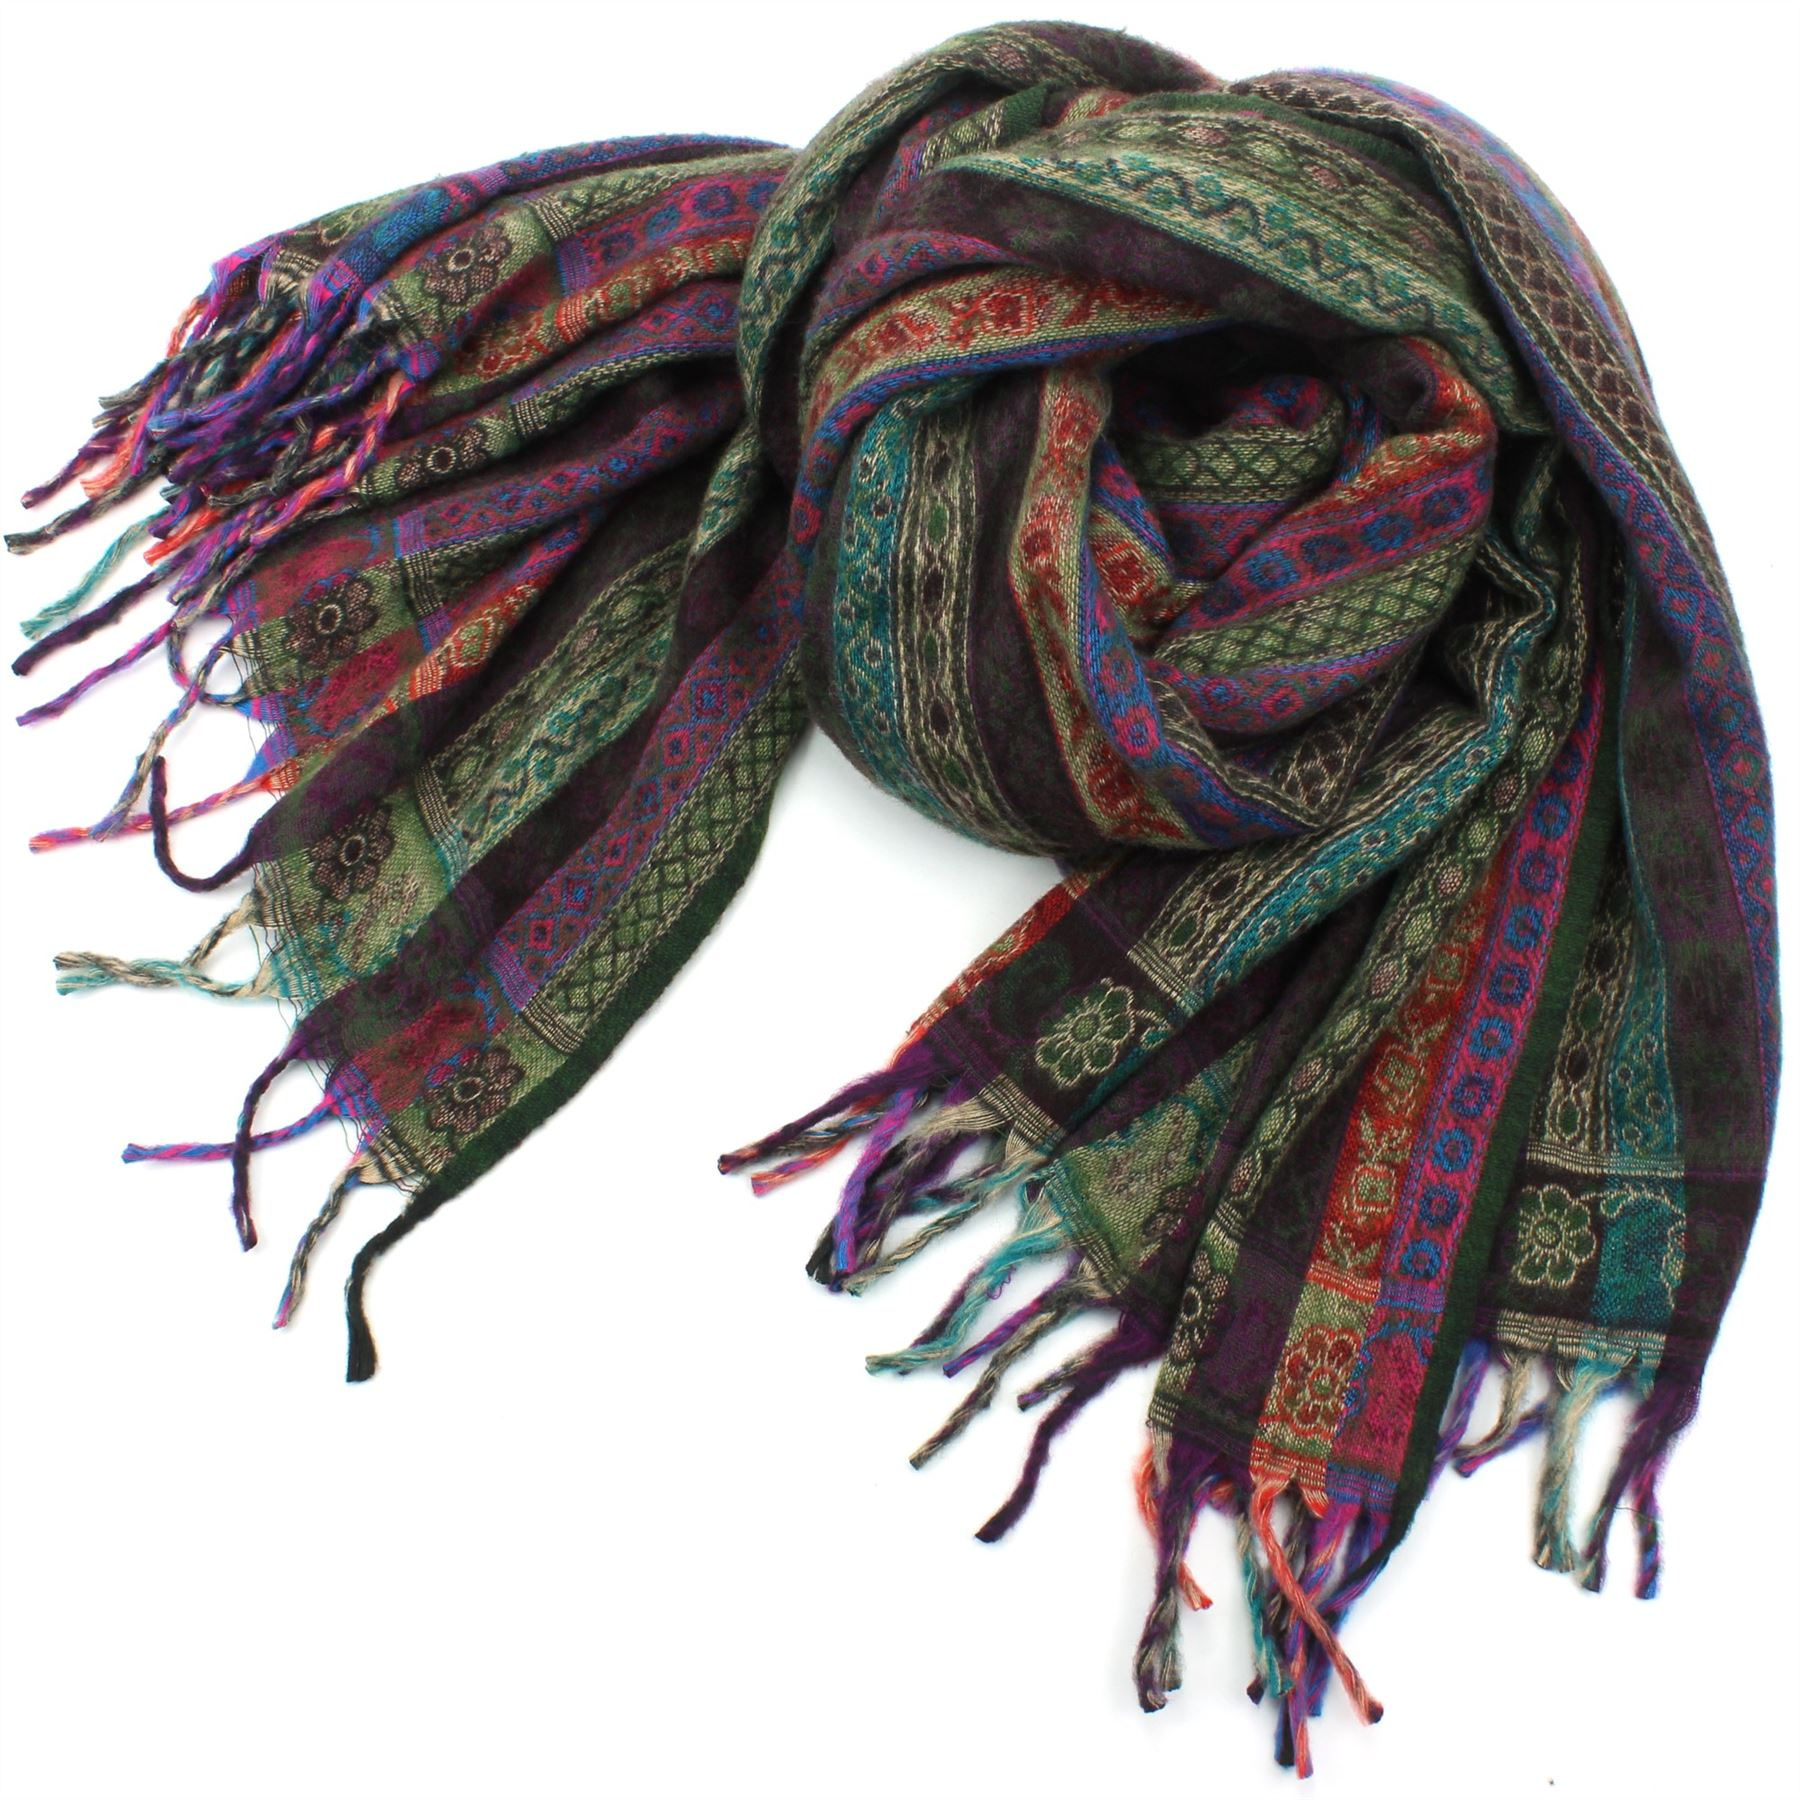 Acrylic-Wool-Blanket-Shawl-Wrap-Throw-Finest-Softest-India-Stripe-Paisley-Travel thumbnail 29